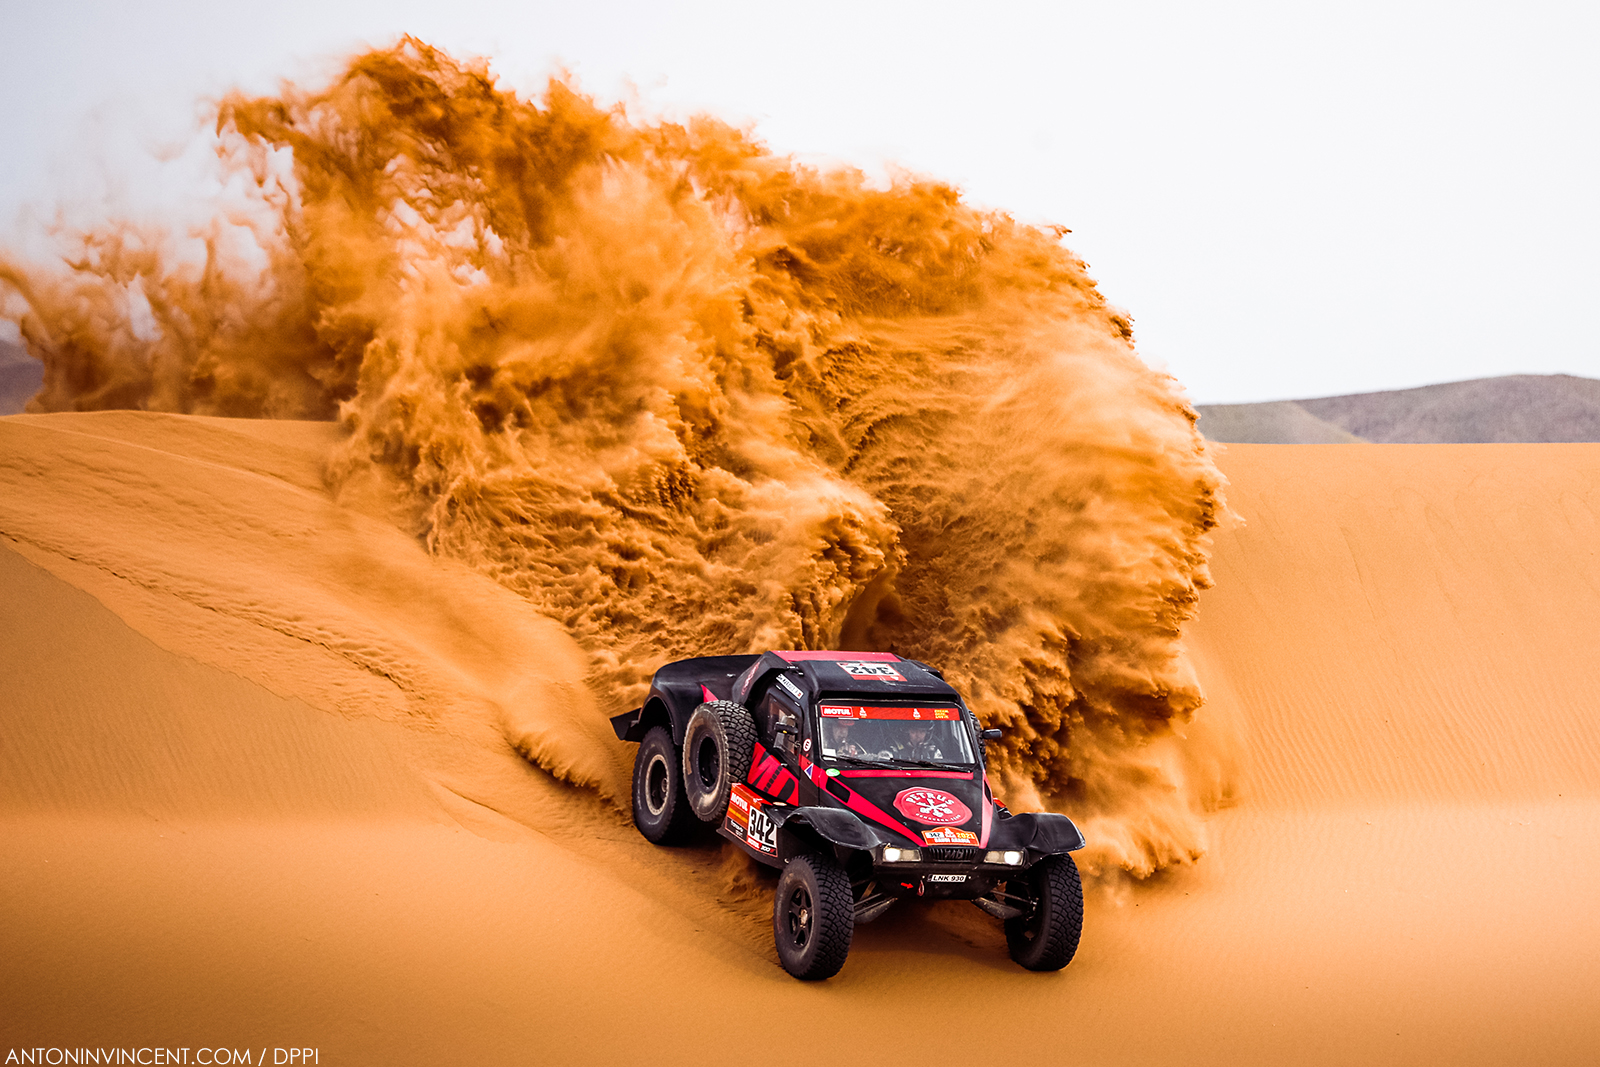 342 Petrus Gintas (ltu), Marques Jose (prt), Optimus, Petrus Kombucha Team, Auto, action during the 11th stage of the Dakar 2021 between Al-Ula and Yanbu, in Saudi Arabia on January 14, 2021 - Photo Antonin Vincent / DPPI